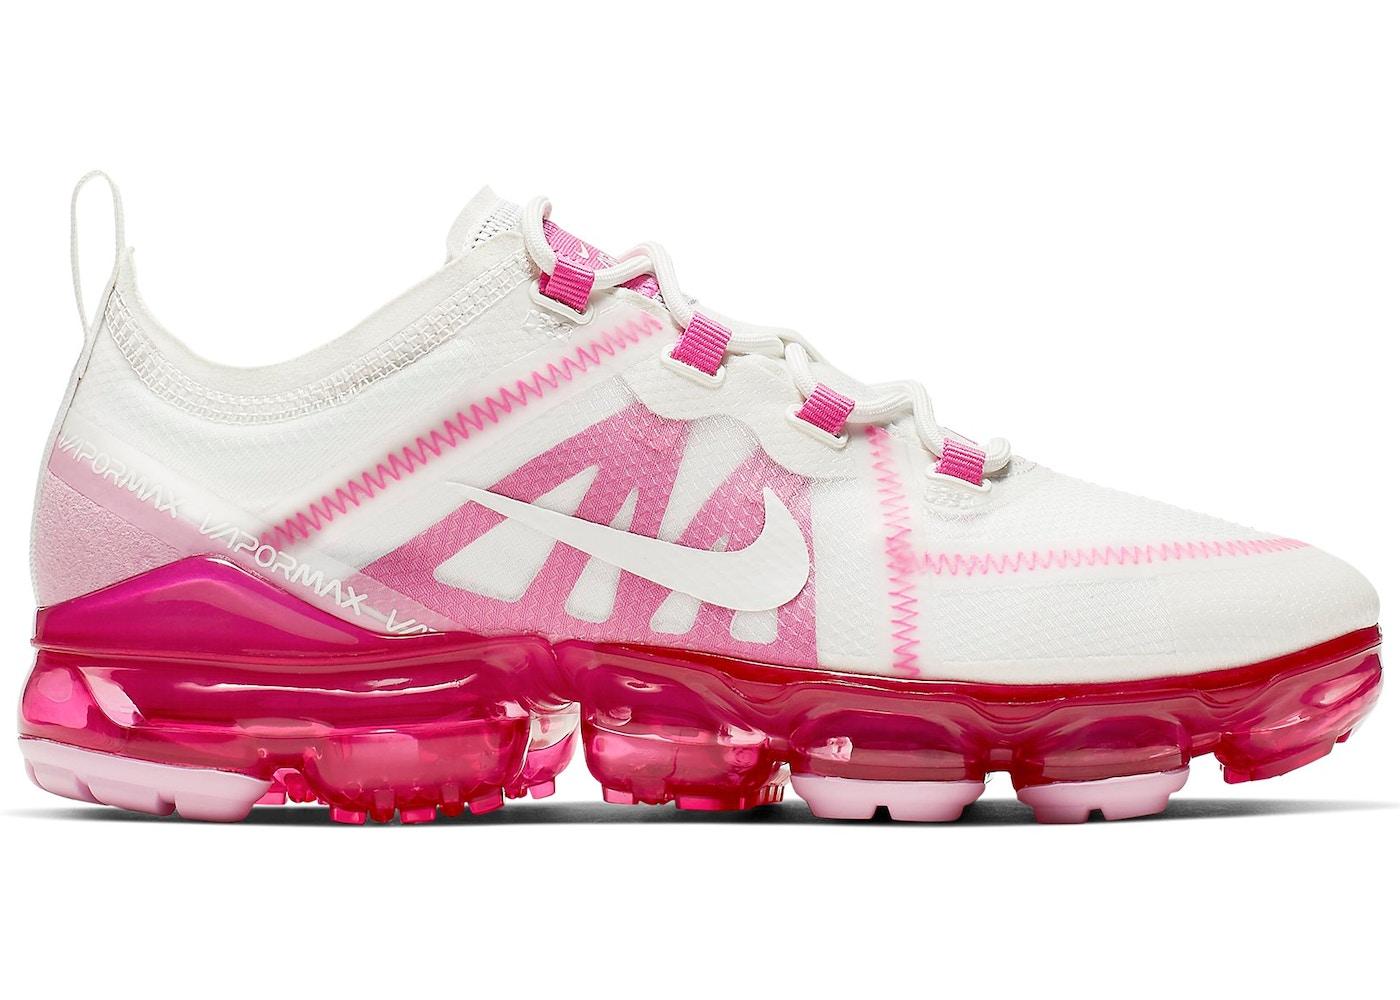 big sale 27215 9c51d Nike Air Max VaporMax Shoes - Release Date